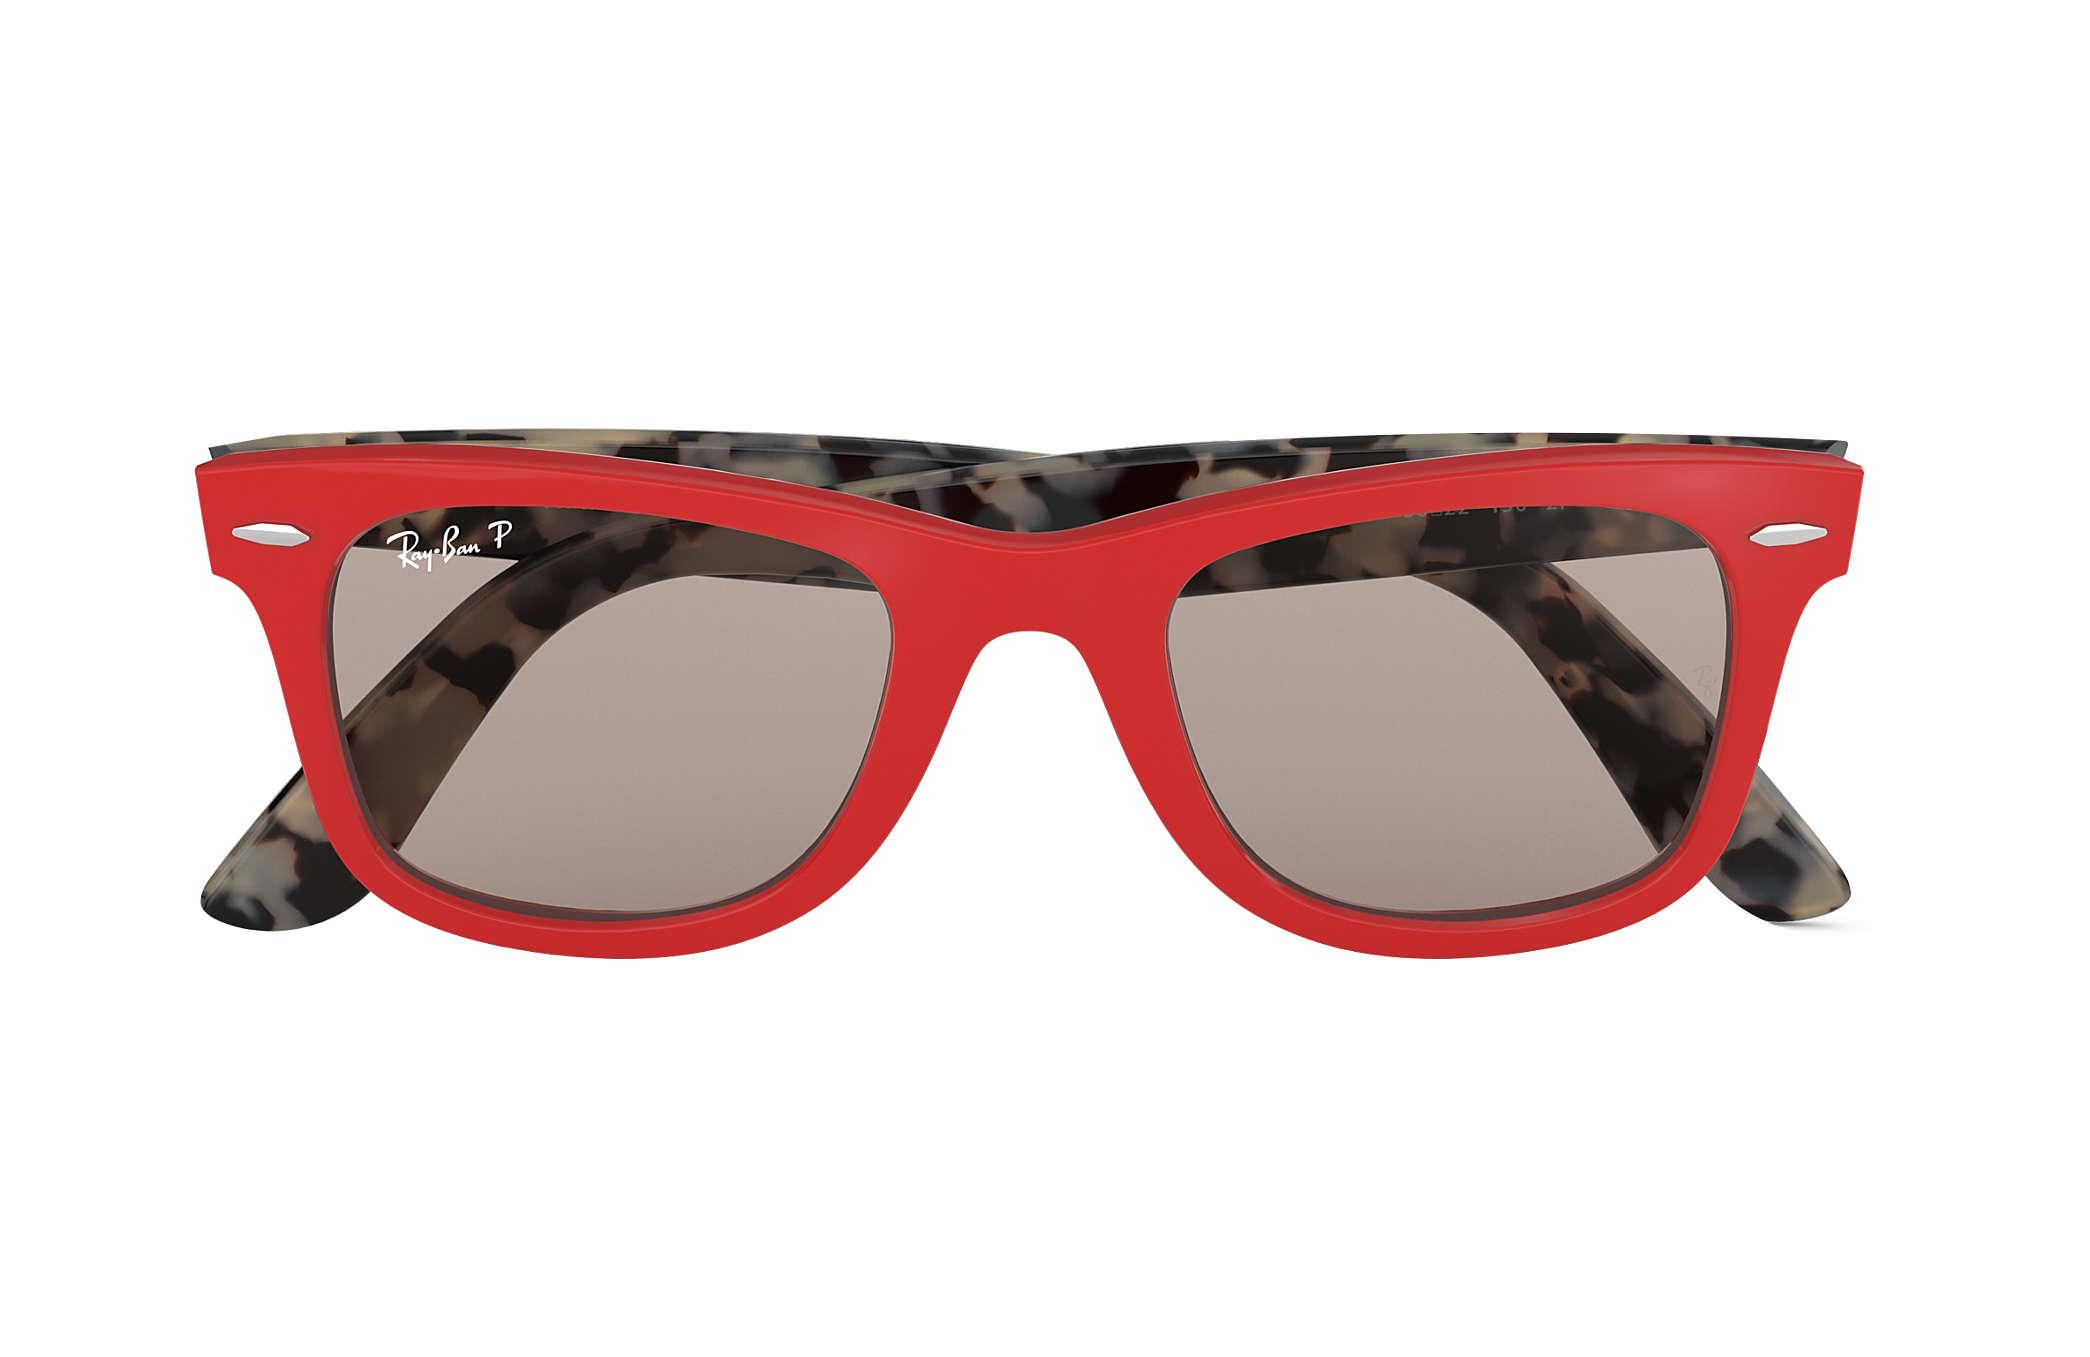 eb80c1d2ddf6 Ray-Ban Wayfarer Pop RB2140 Red - Acetate - Grey Polarized Lenses ...